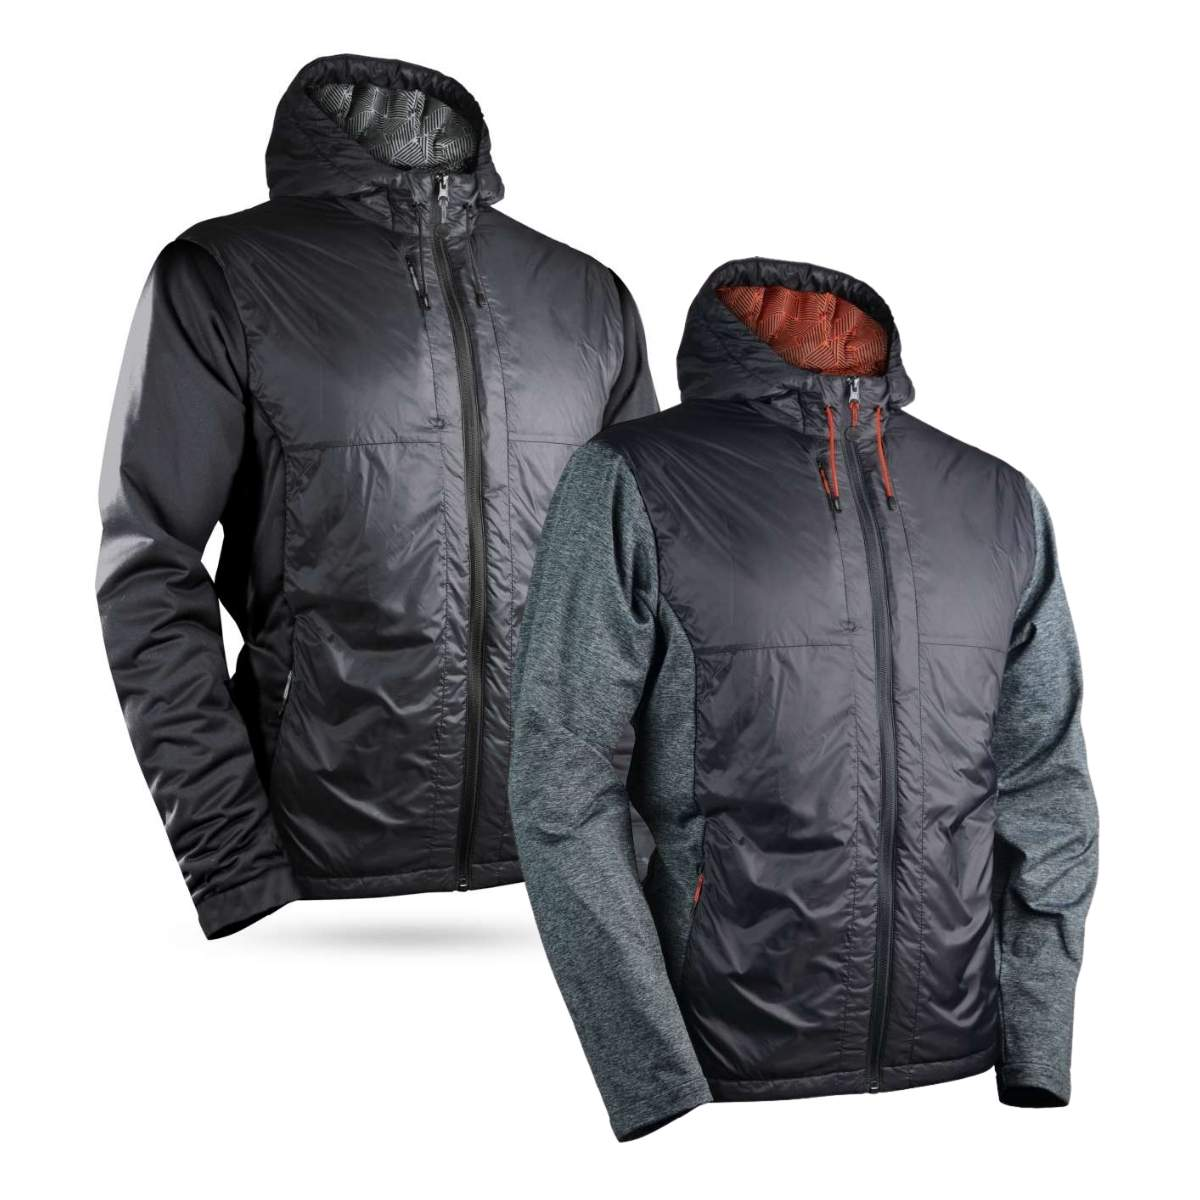 Sun Mountain 2021 Men's Colter Jacket